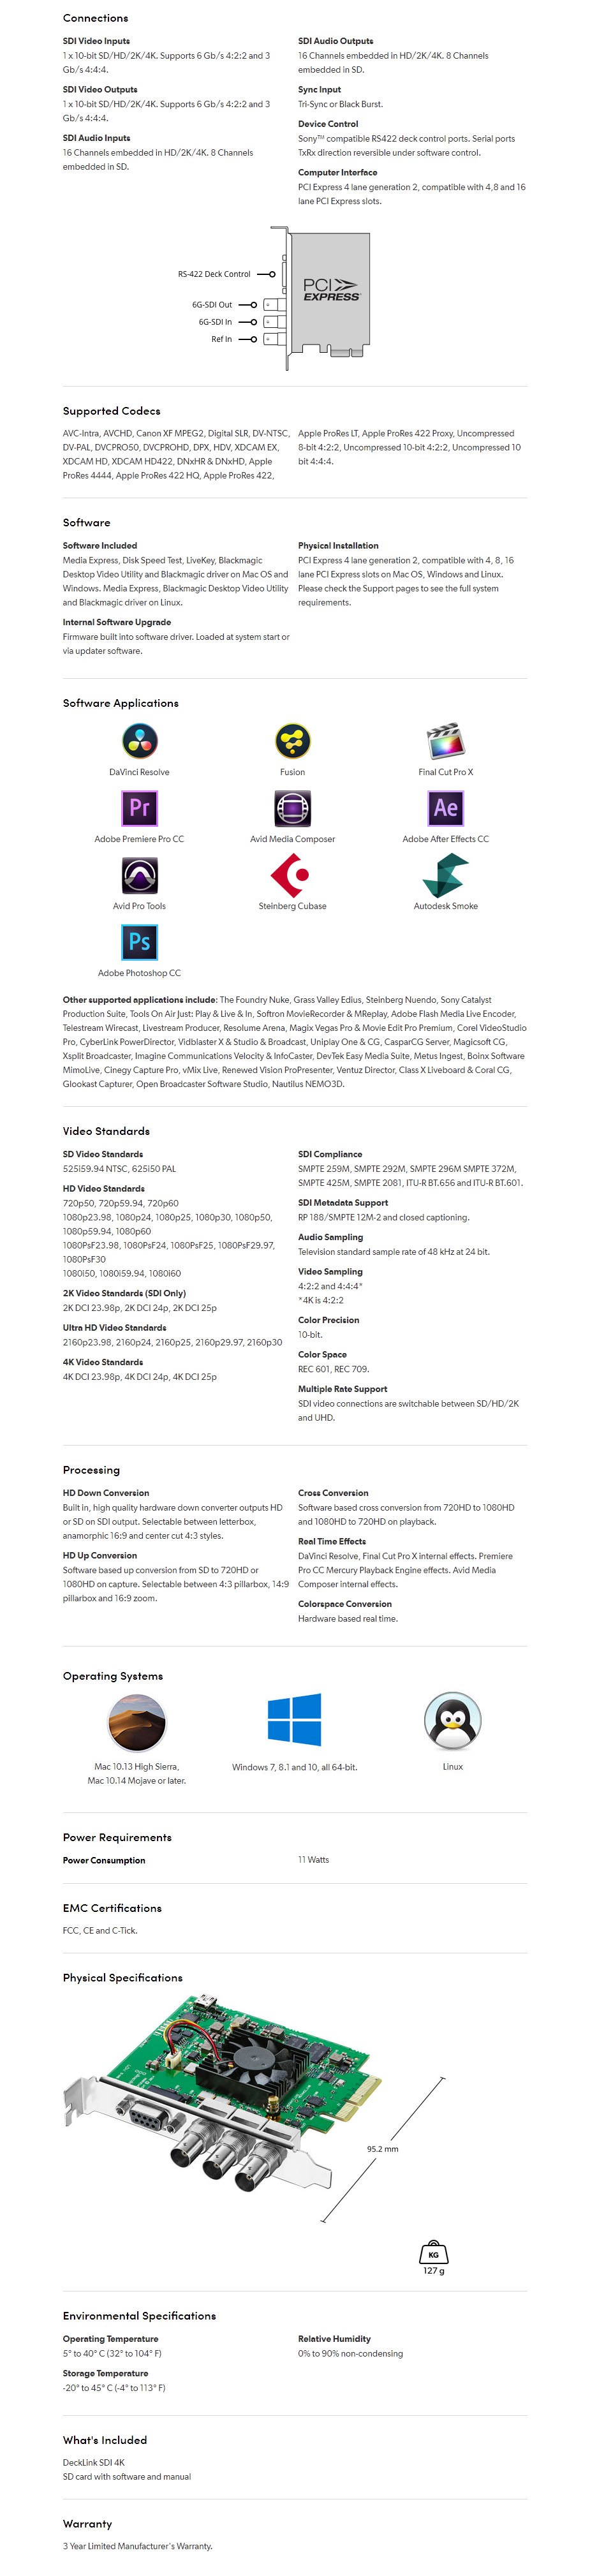 Blackmagic Design DeckLink SDI 4K Capture/Playback Card - Overview 1